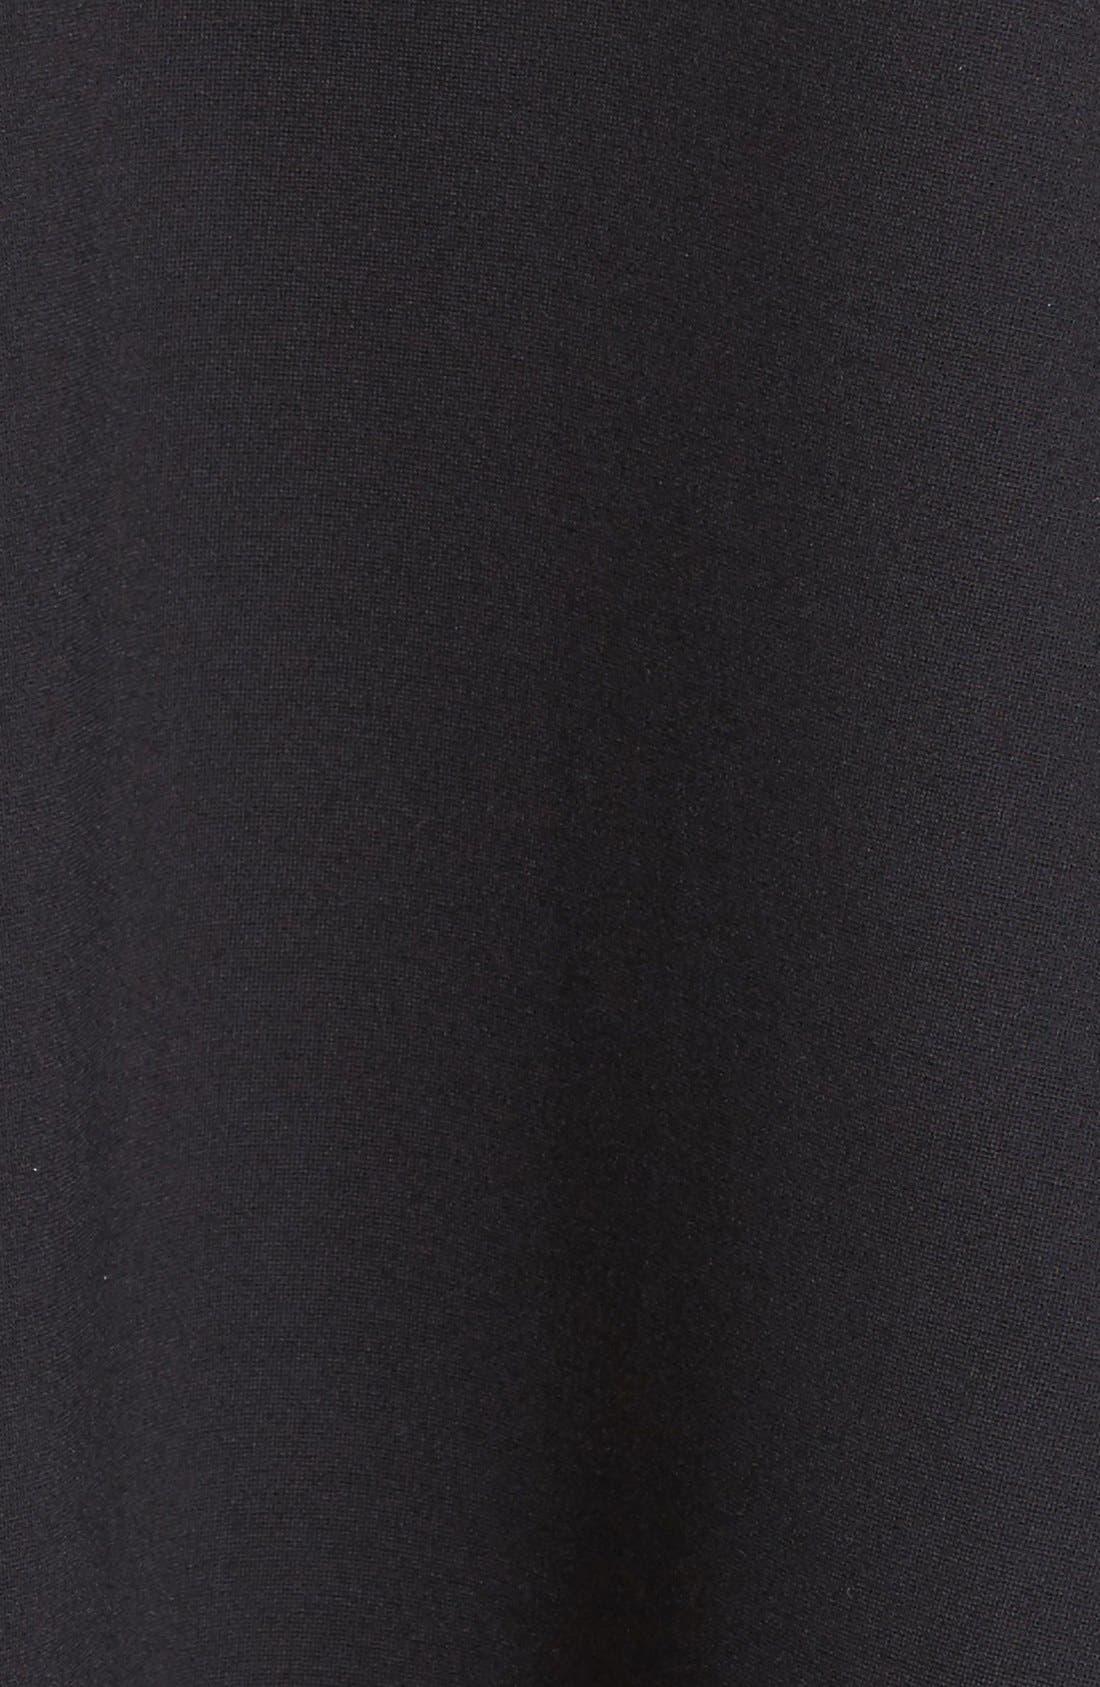 'Viola' Stretch Fit & Flare Dress,                             Alternate thumbnail 6, color,                             001